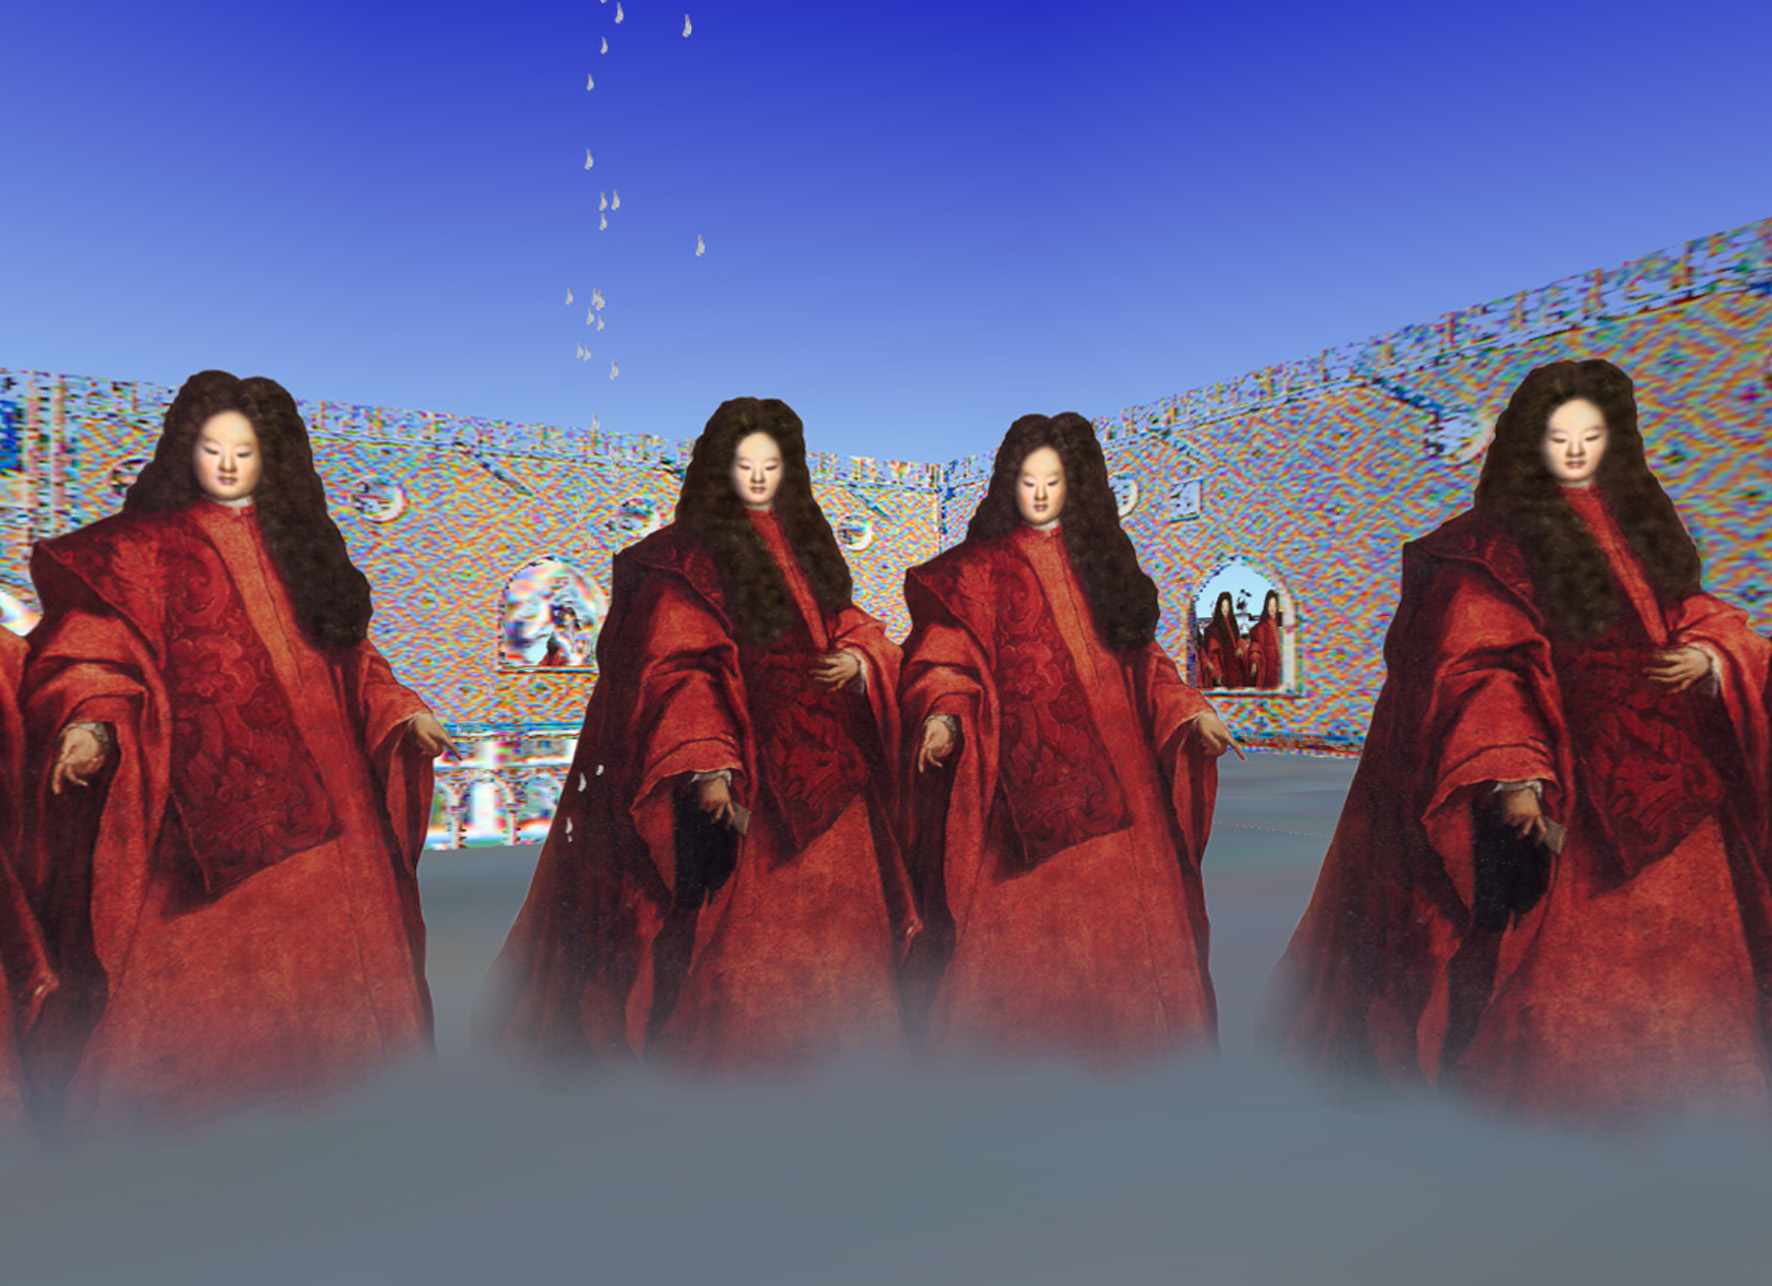 TamikoThiel,Avogadori in the Opal Palace, from:The Travels of Mariko Horo